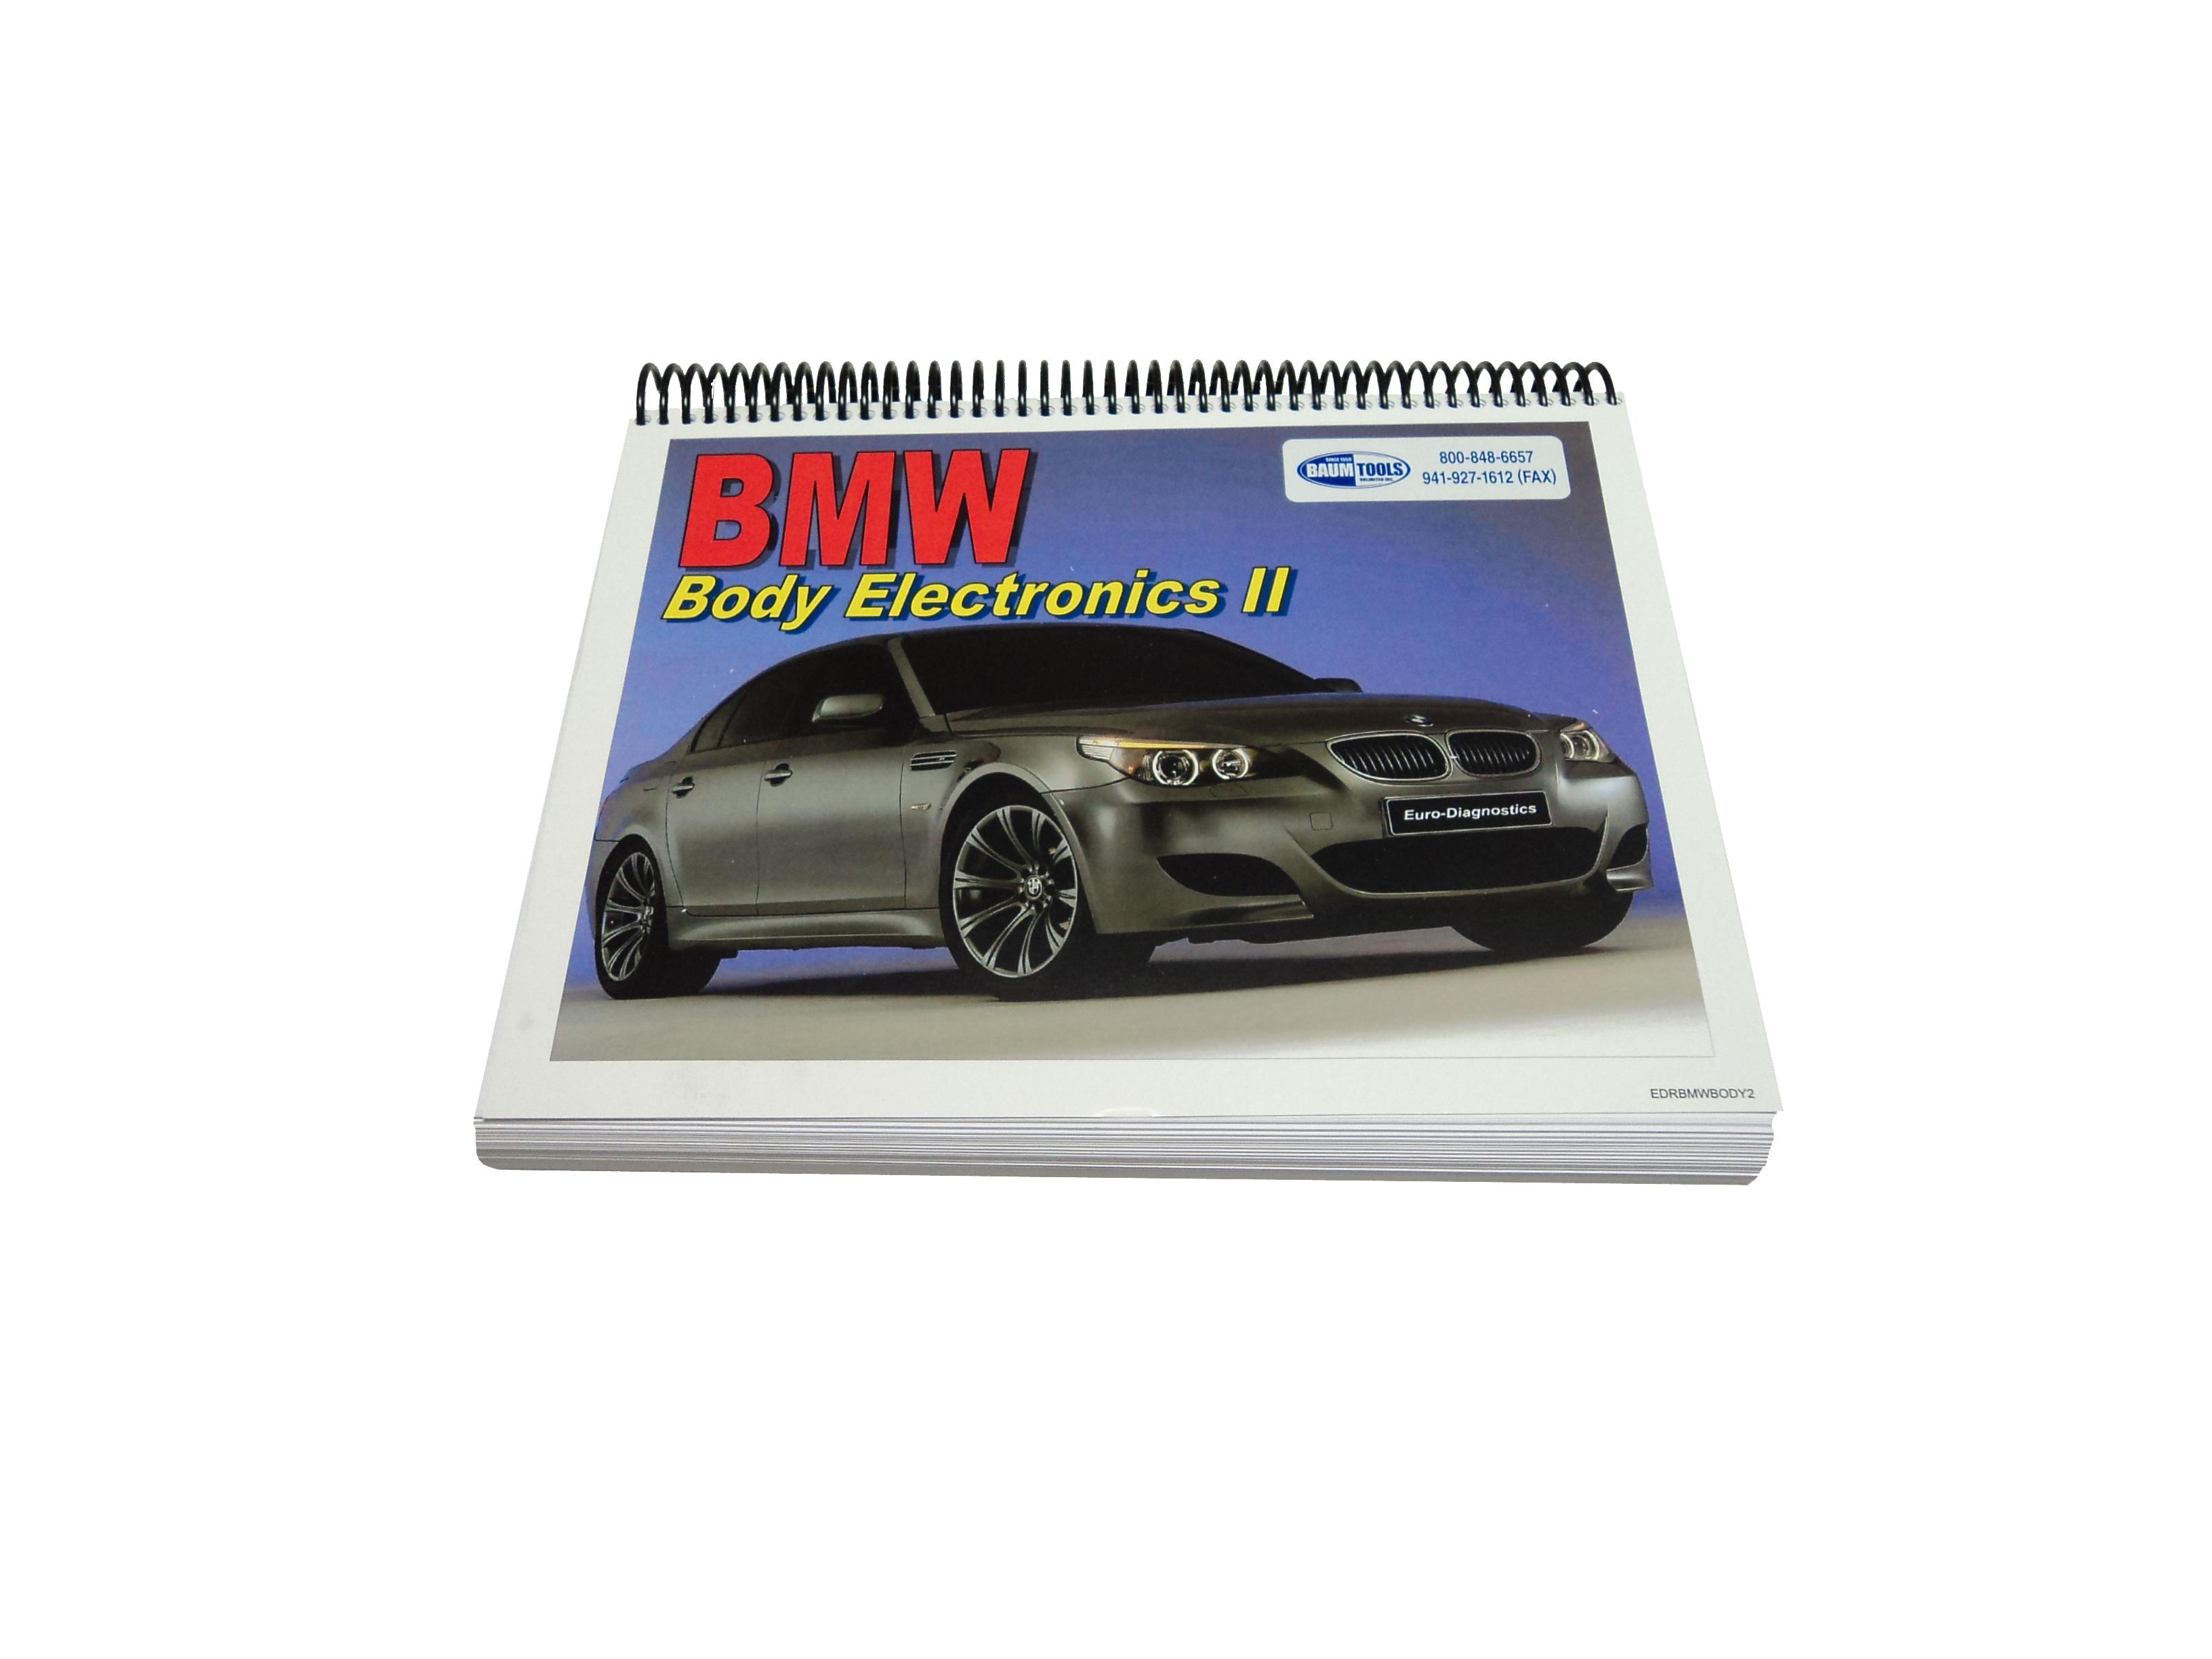 BMW Body Electronics, Volume Two